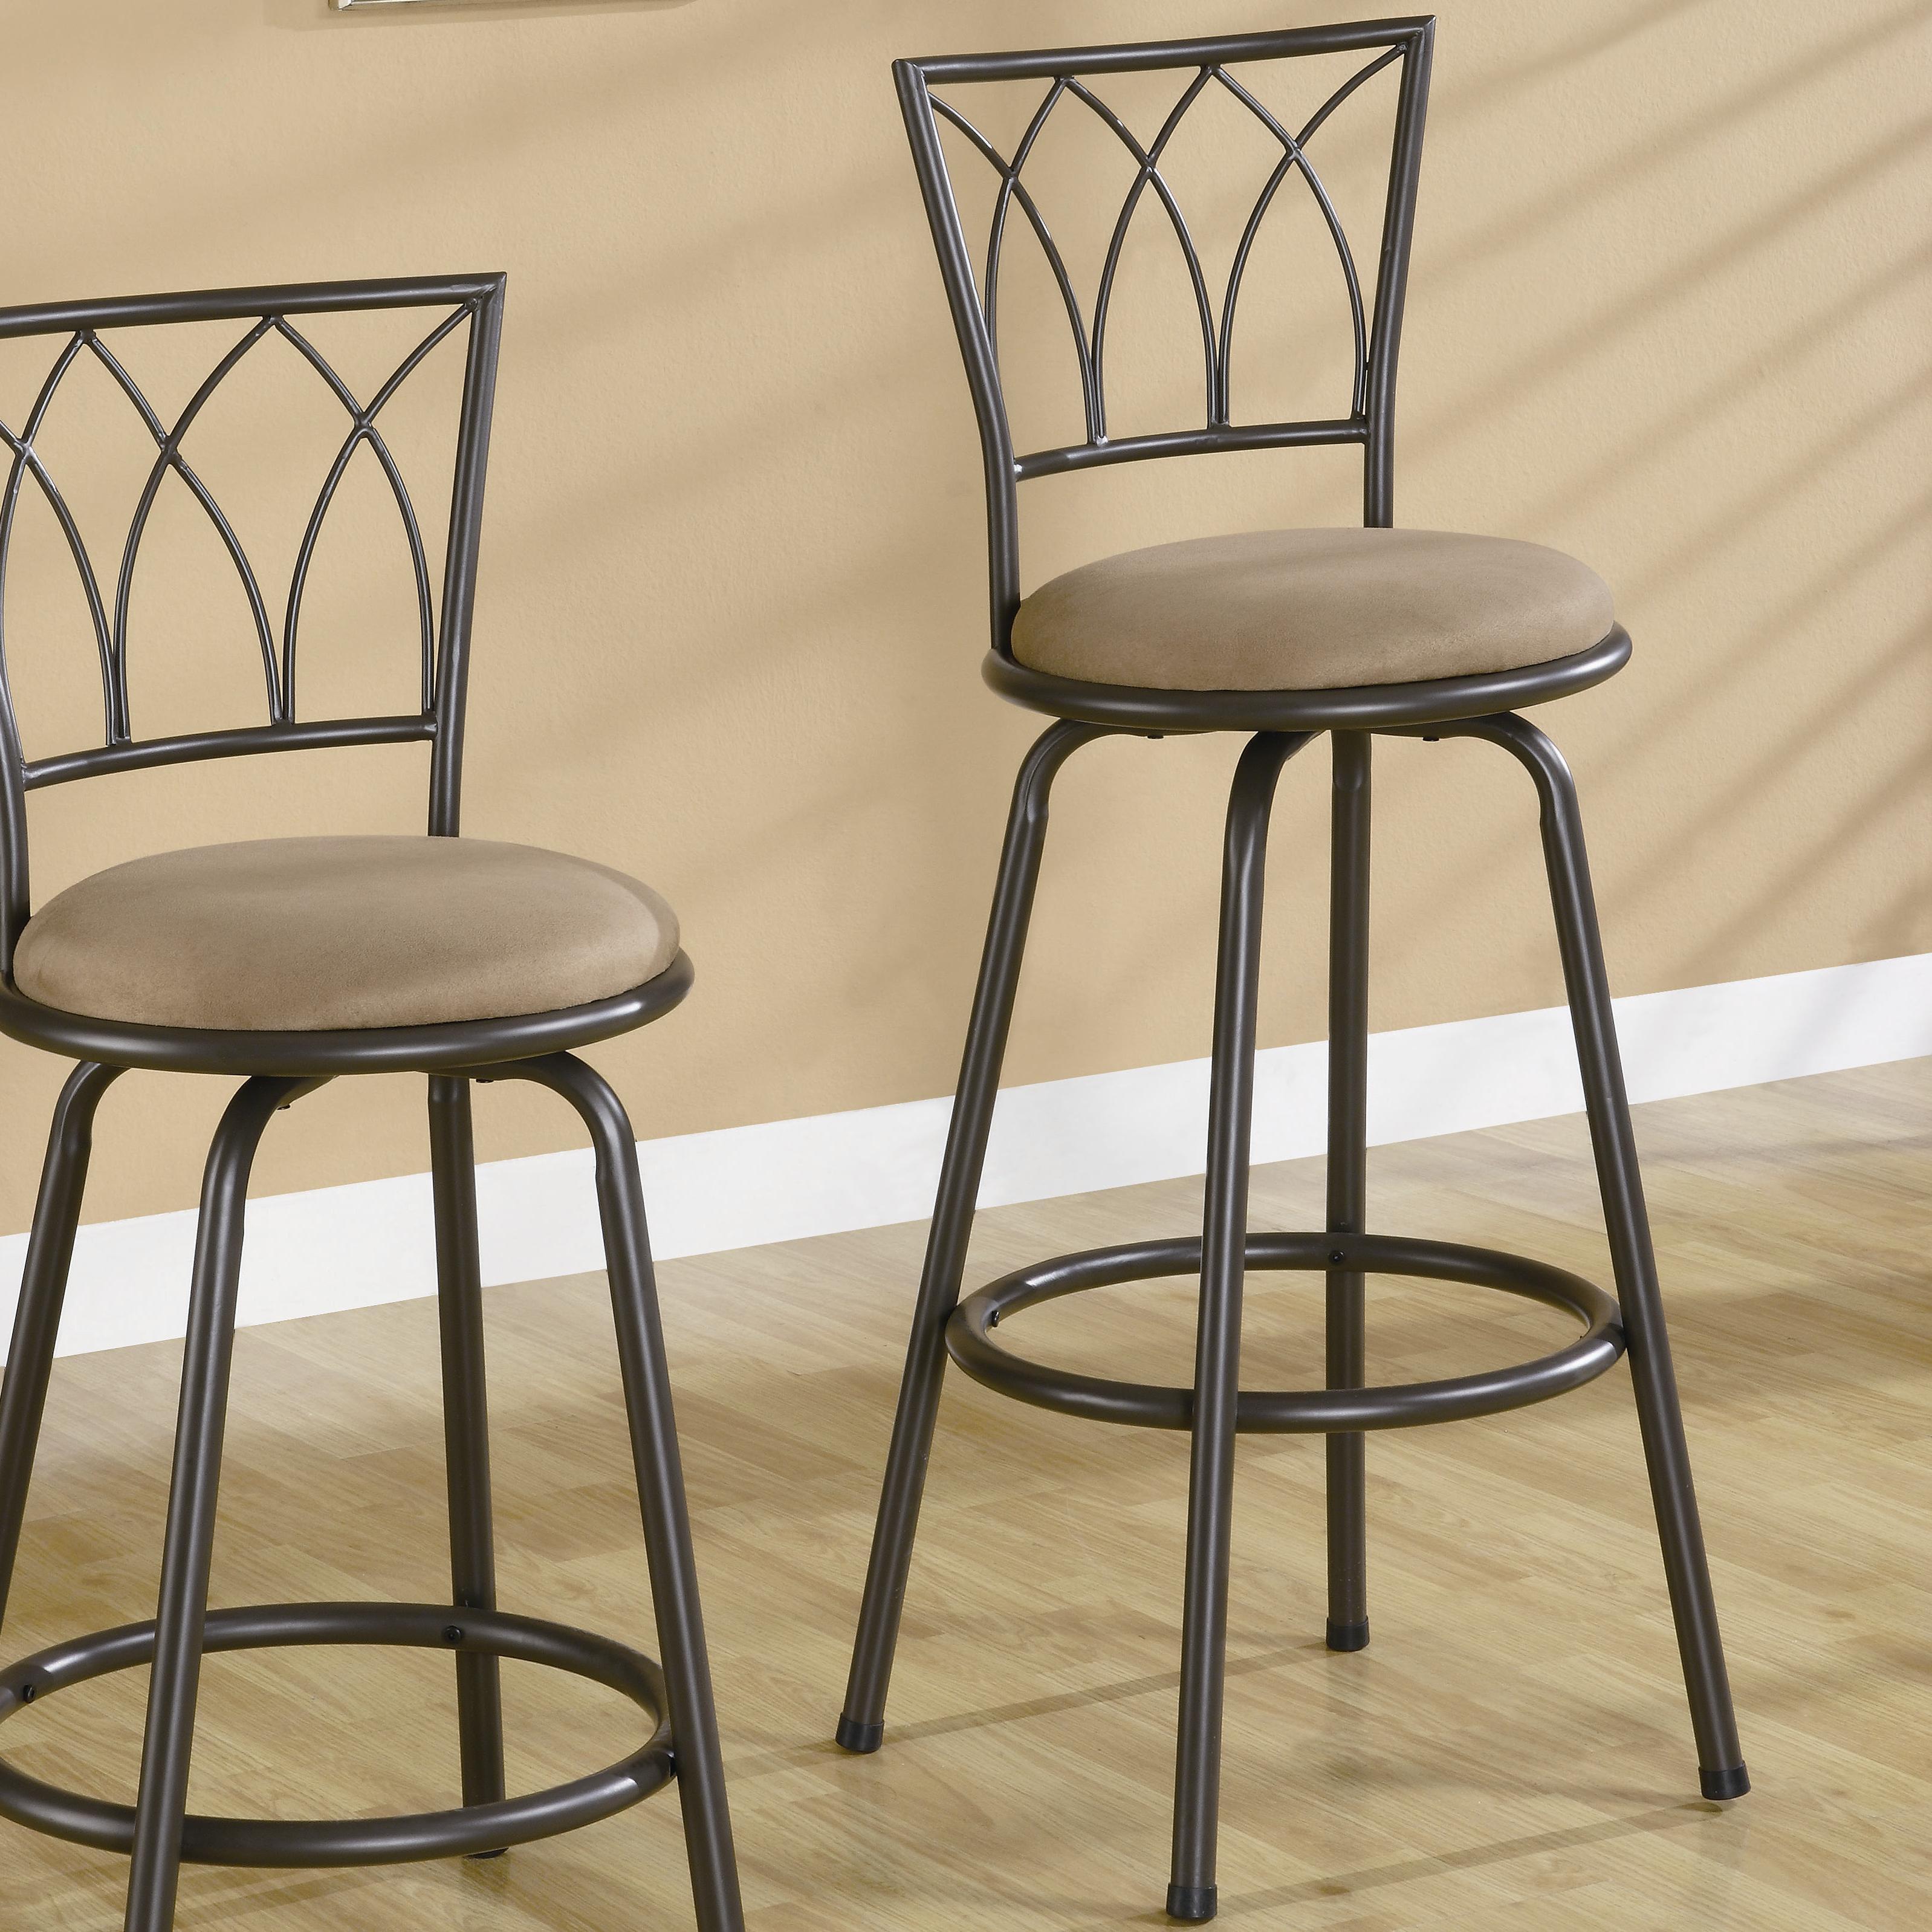 "Coaster Dining Chairs and Bar Stools 29"" Metal Bar Stool - Item Number: 122020"